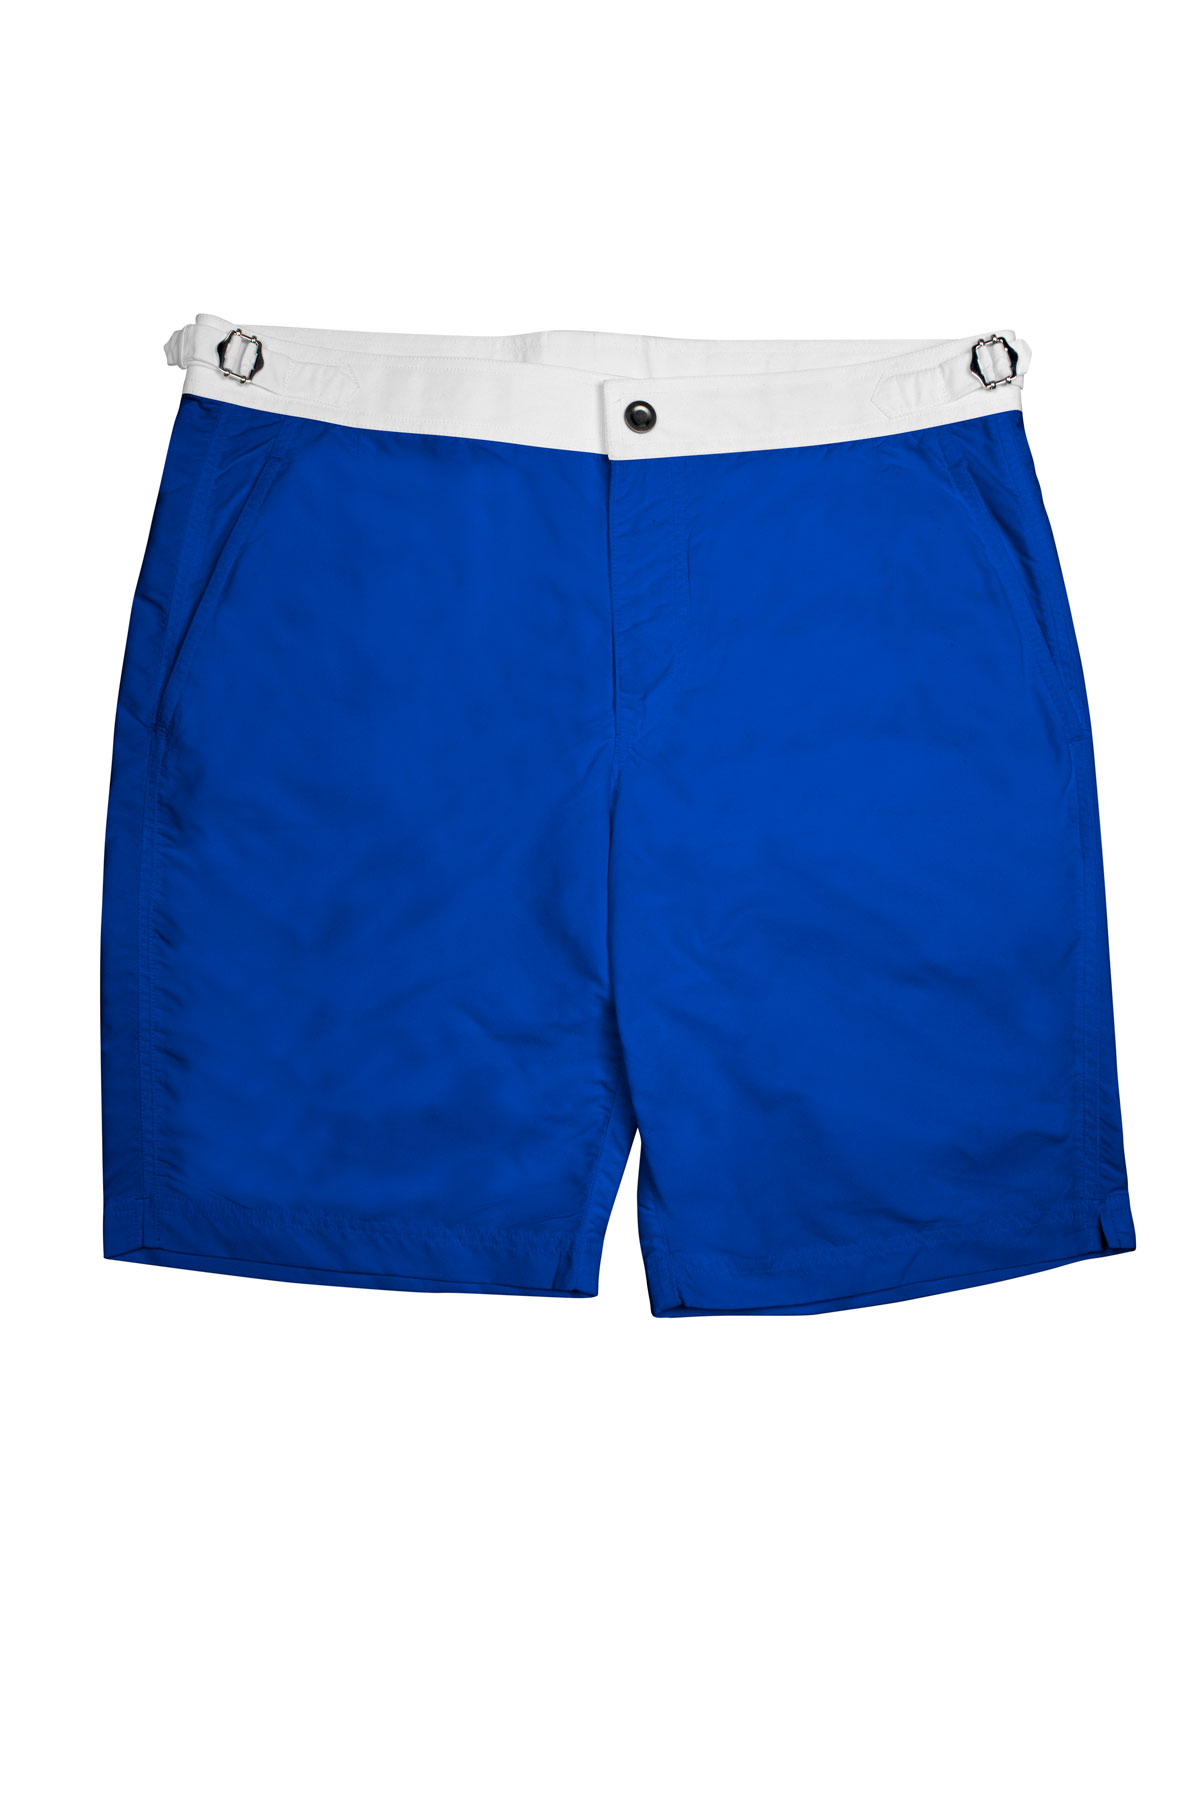 Royal Blue Swim Shorts w White Waistband